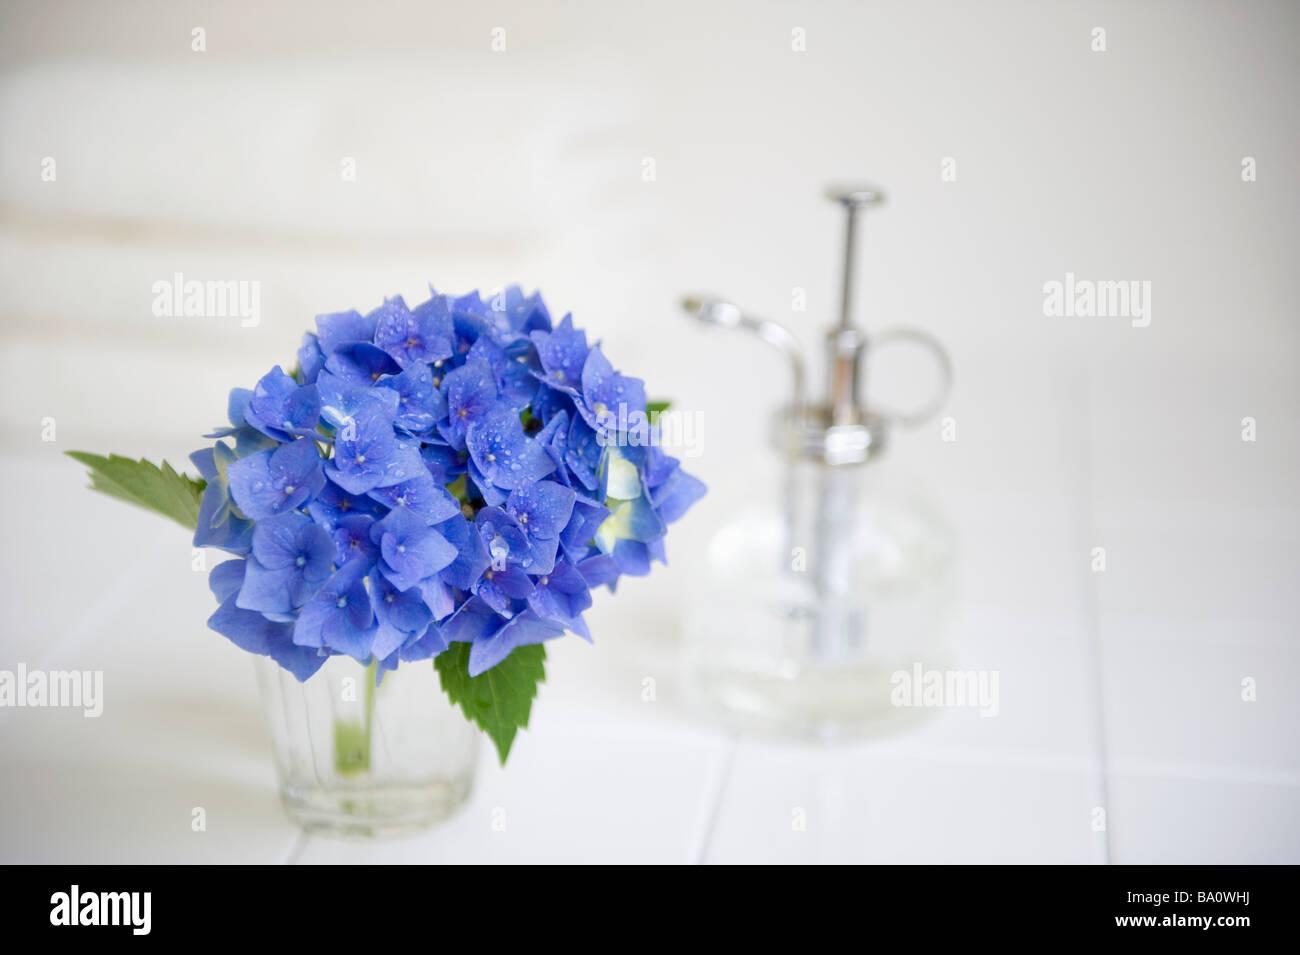 Hydrangea and sprayer - Stock Image